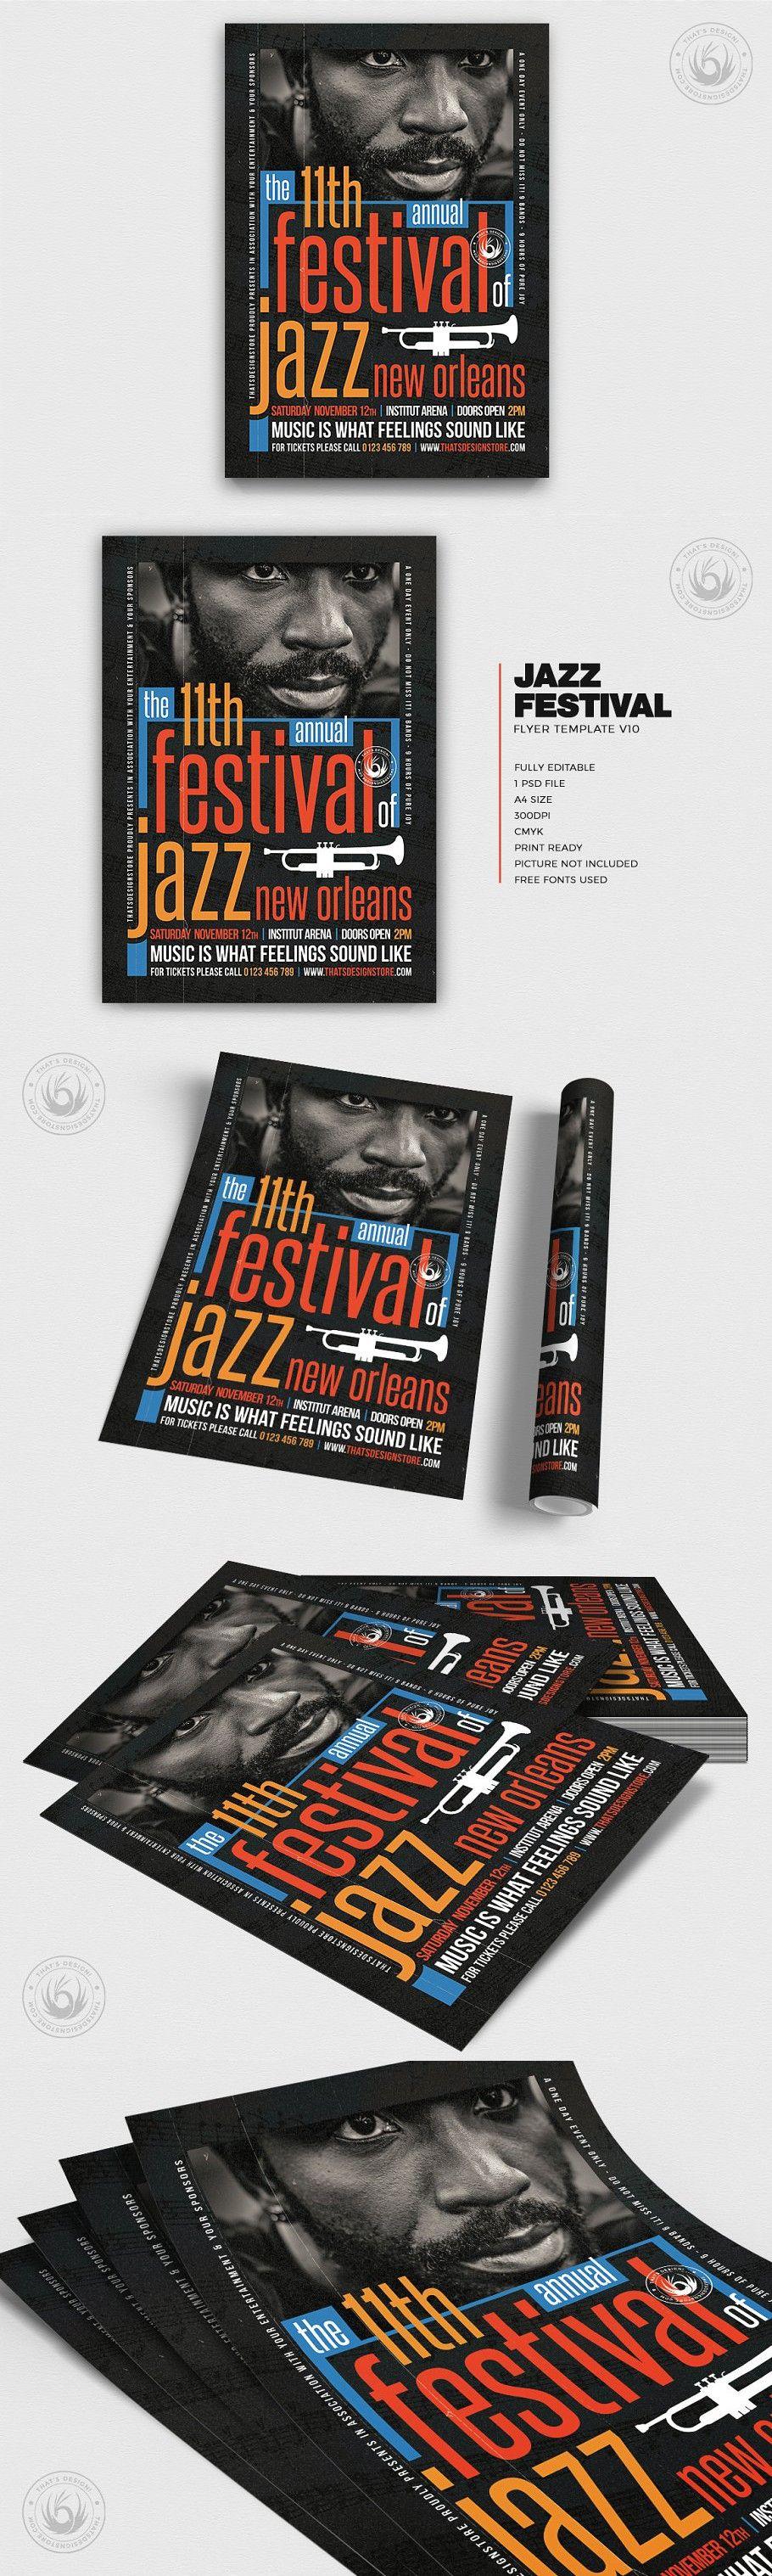 Jazz Festival Flyer Template V10 in 2020 Flyer template